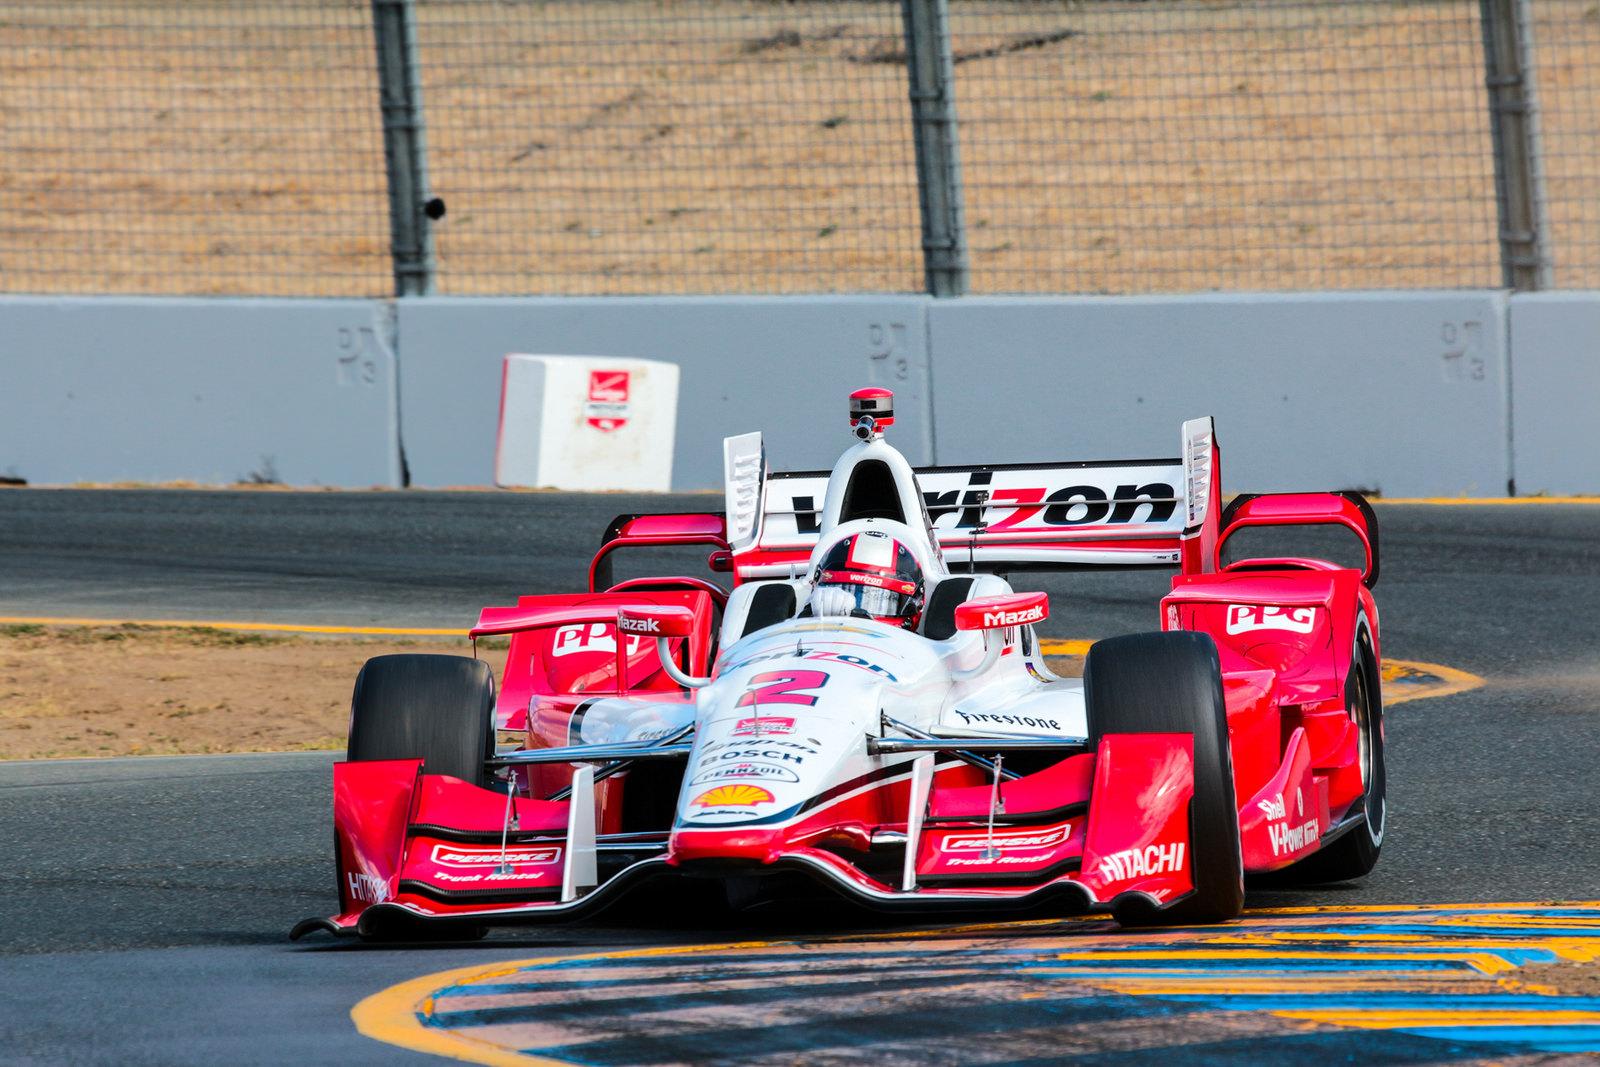 Penske IndyCar #2. Driver: Juan Pablo Montoya.  ©2015 Mark Farouk